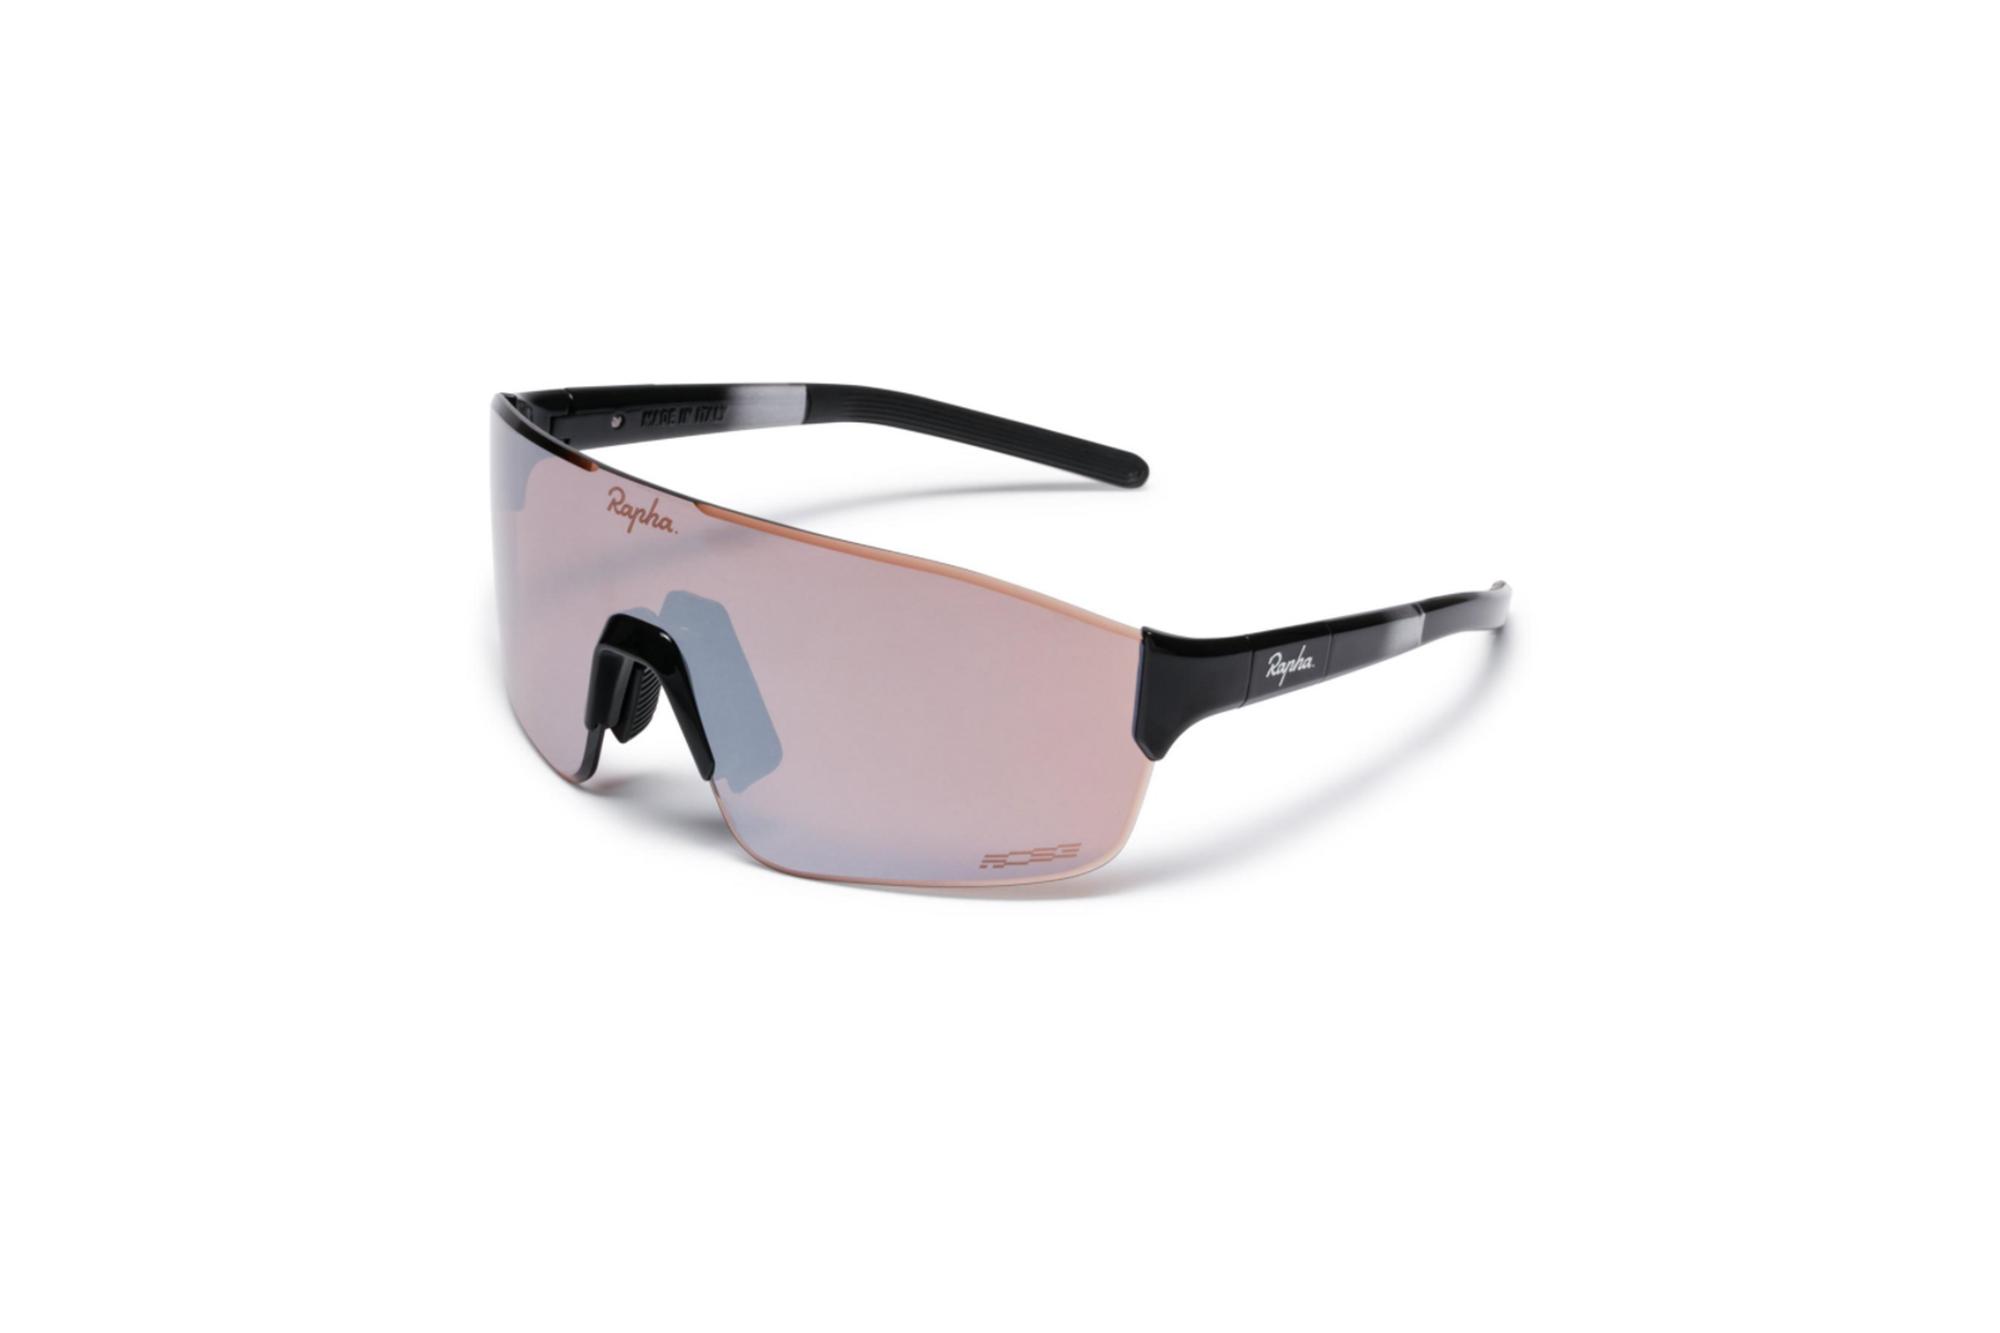 Rapha Pro Team Frameless sunglasses review